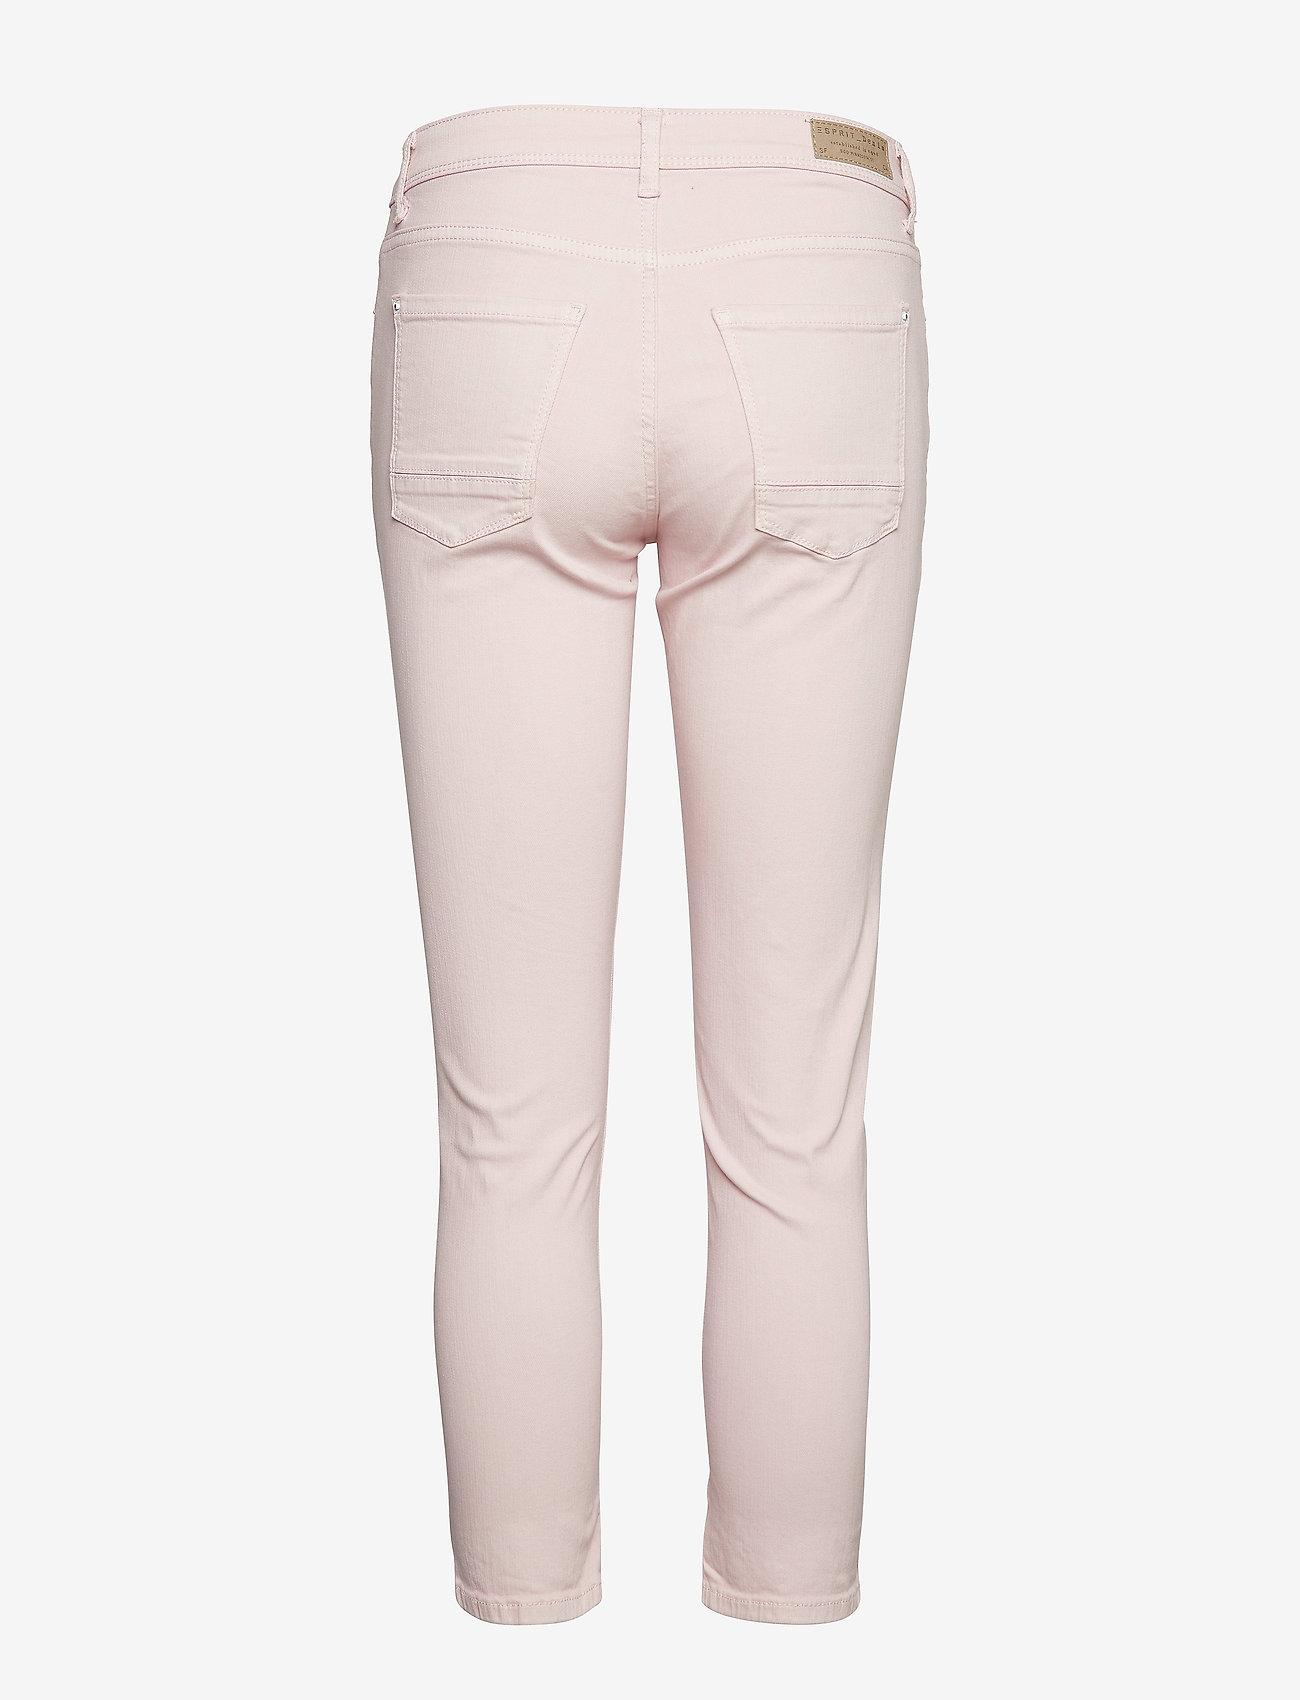 Esprit Casual - Pants denim - skinny jeans - light pink - 1